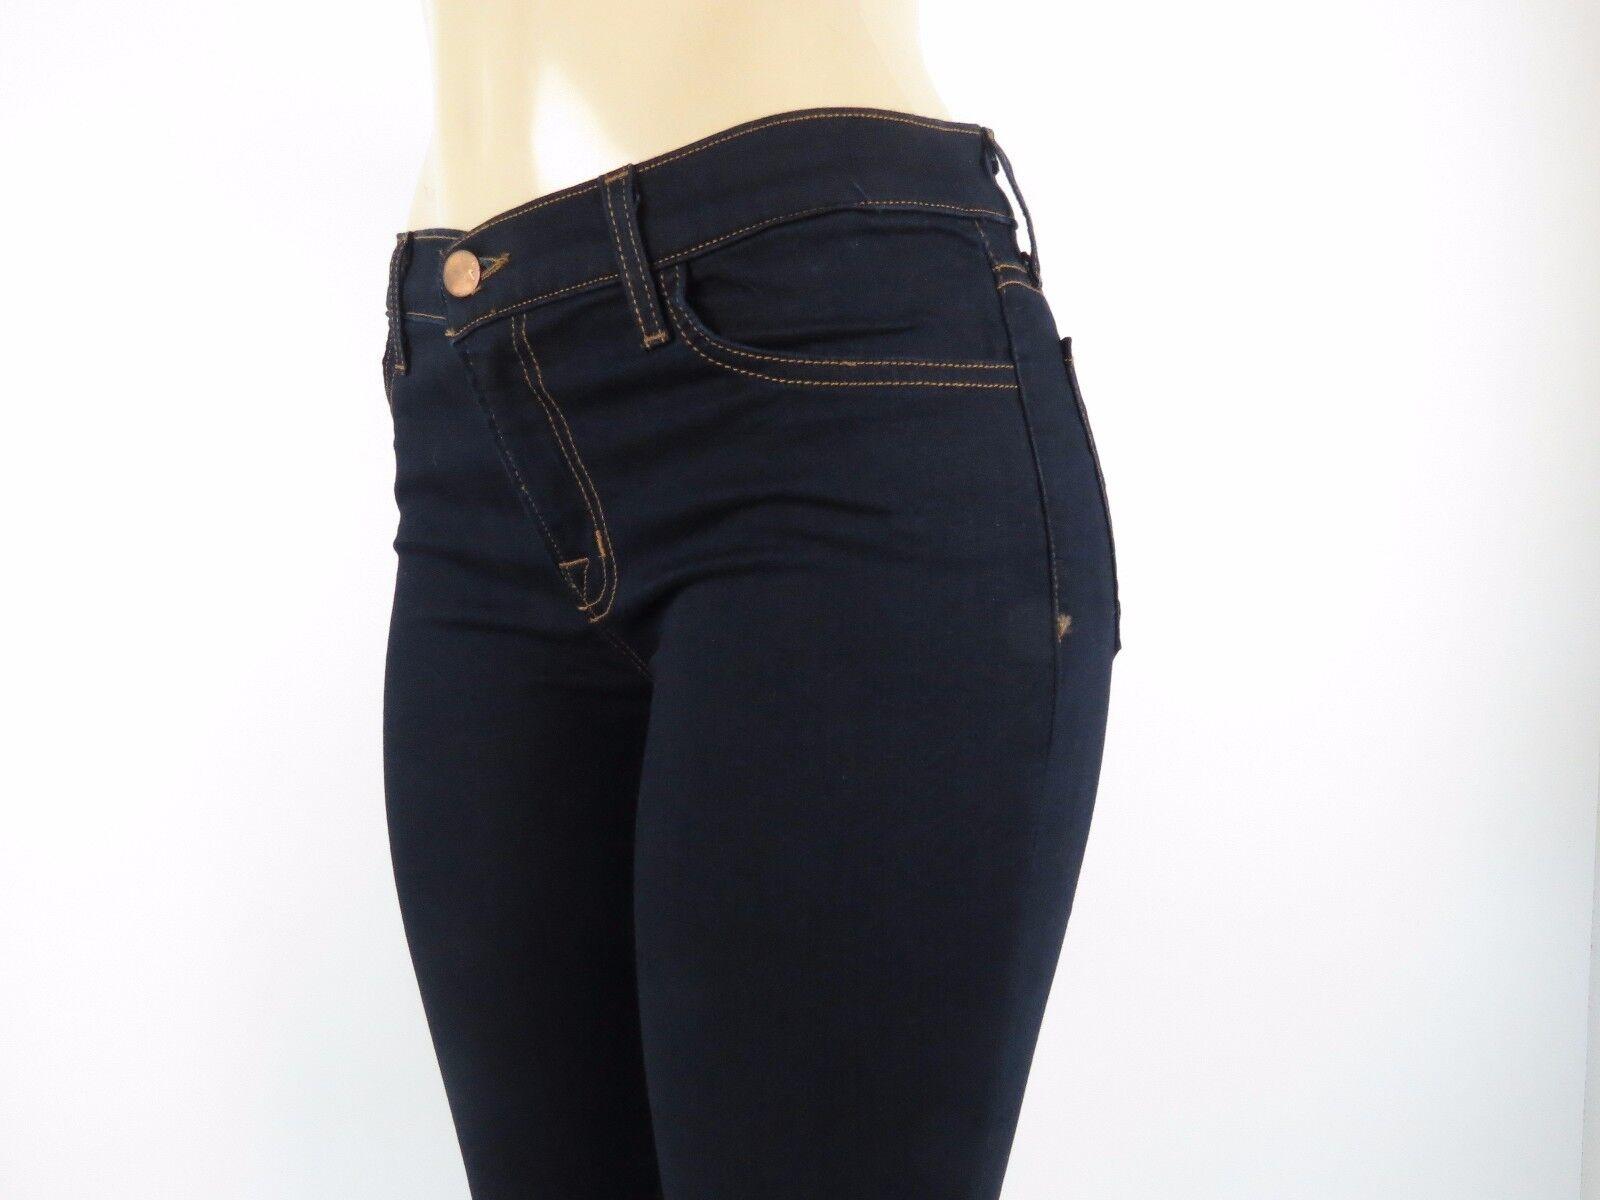 NWT J BRAND WOMENS JEANS CAPRI, PROVENCE blueE, Size 26,Retail  198